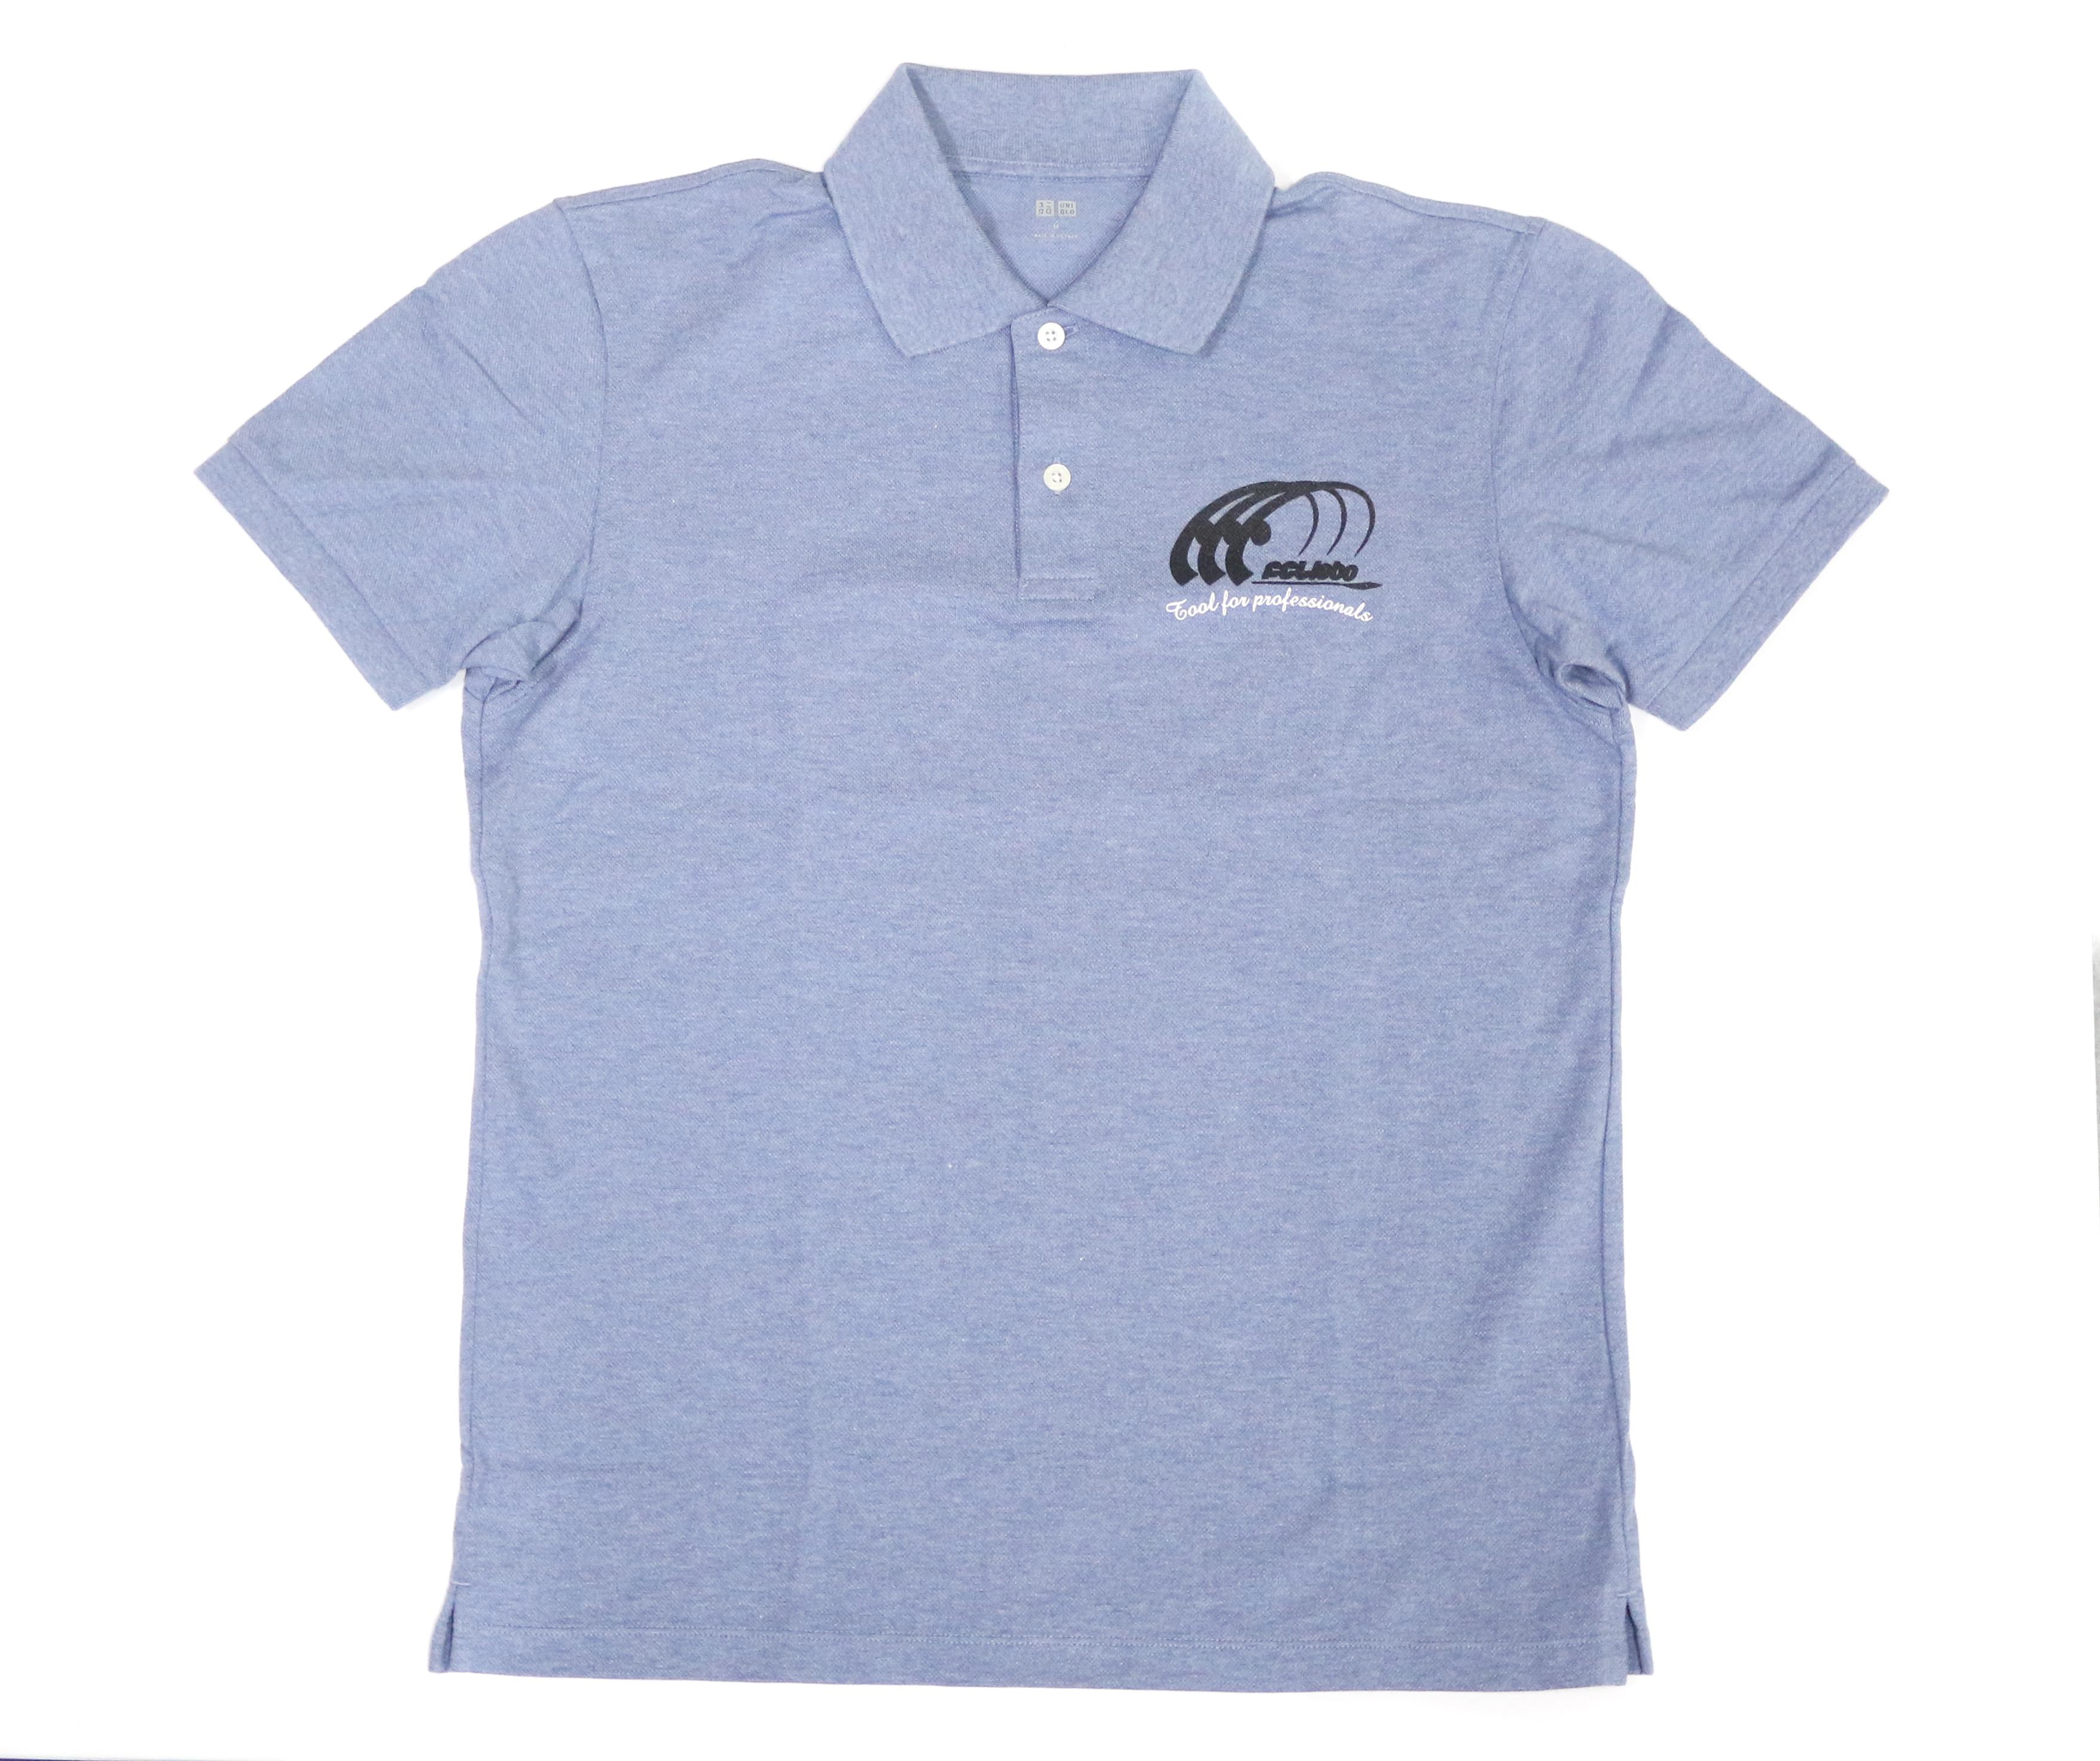 Sale FCL Labo Polo Shirt Short Sleeve Size M Blue (blue)